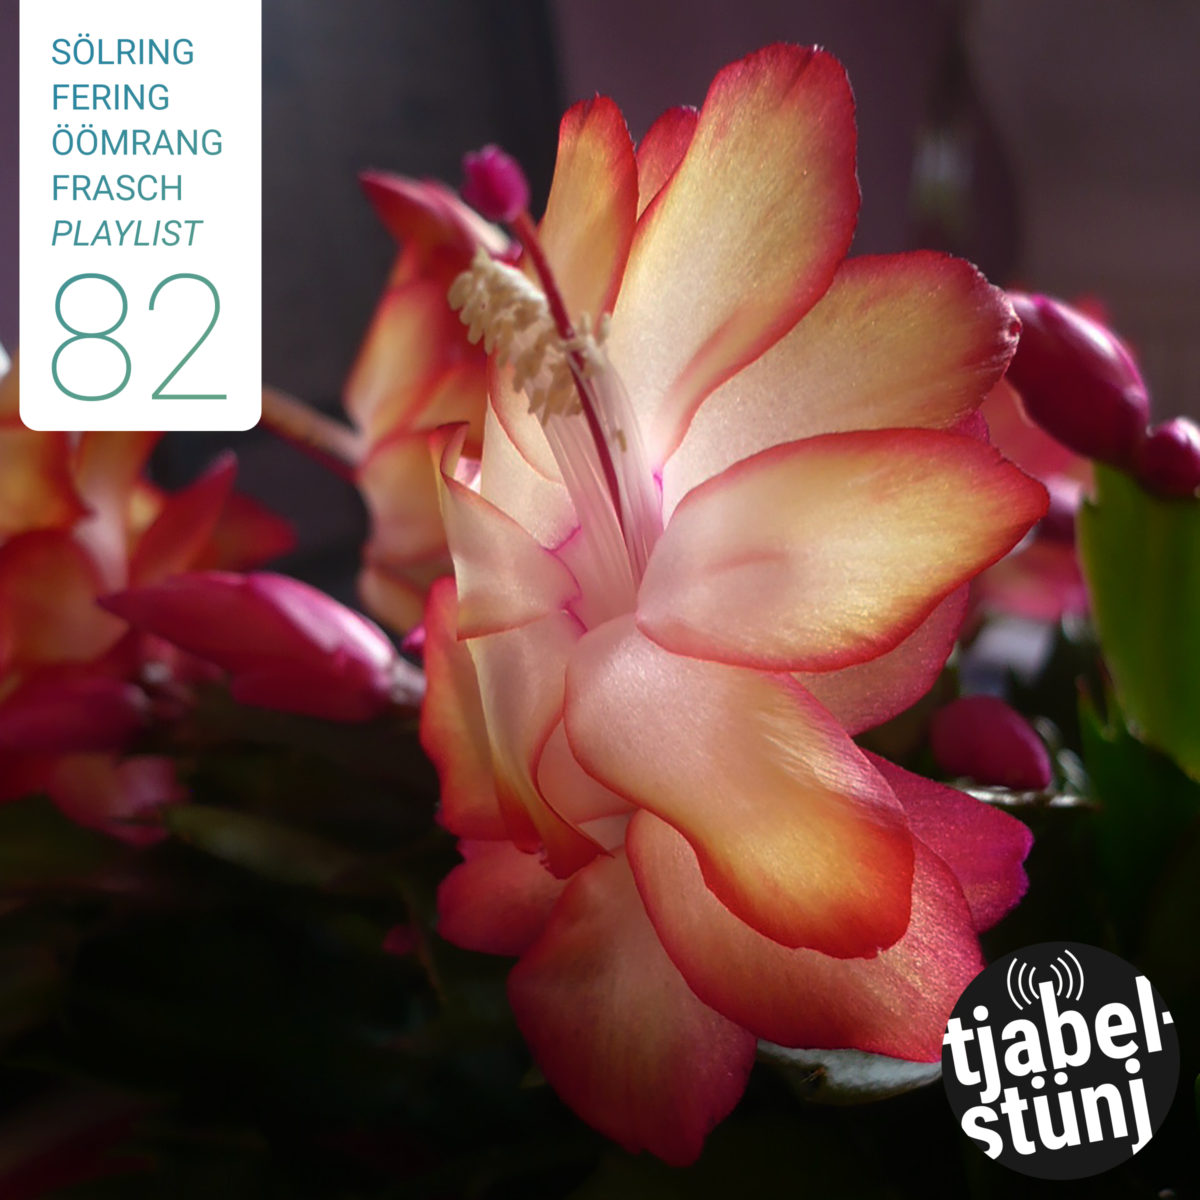 Playlist #82